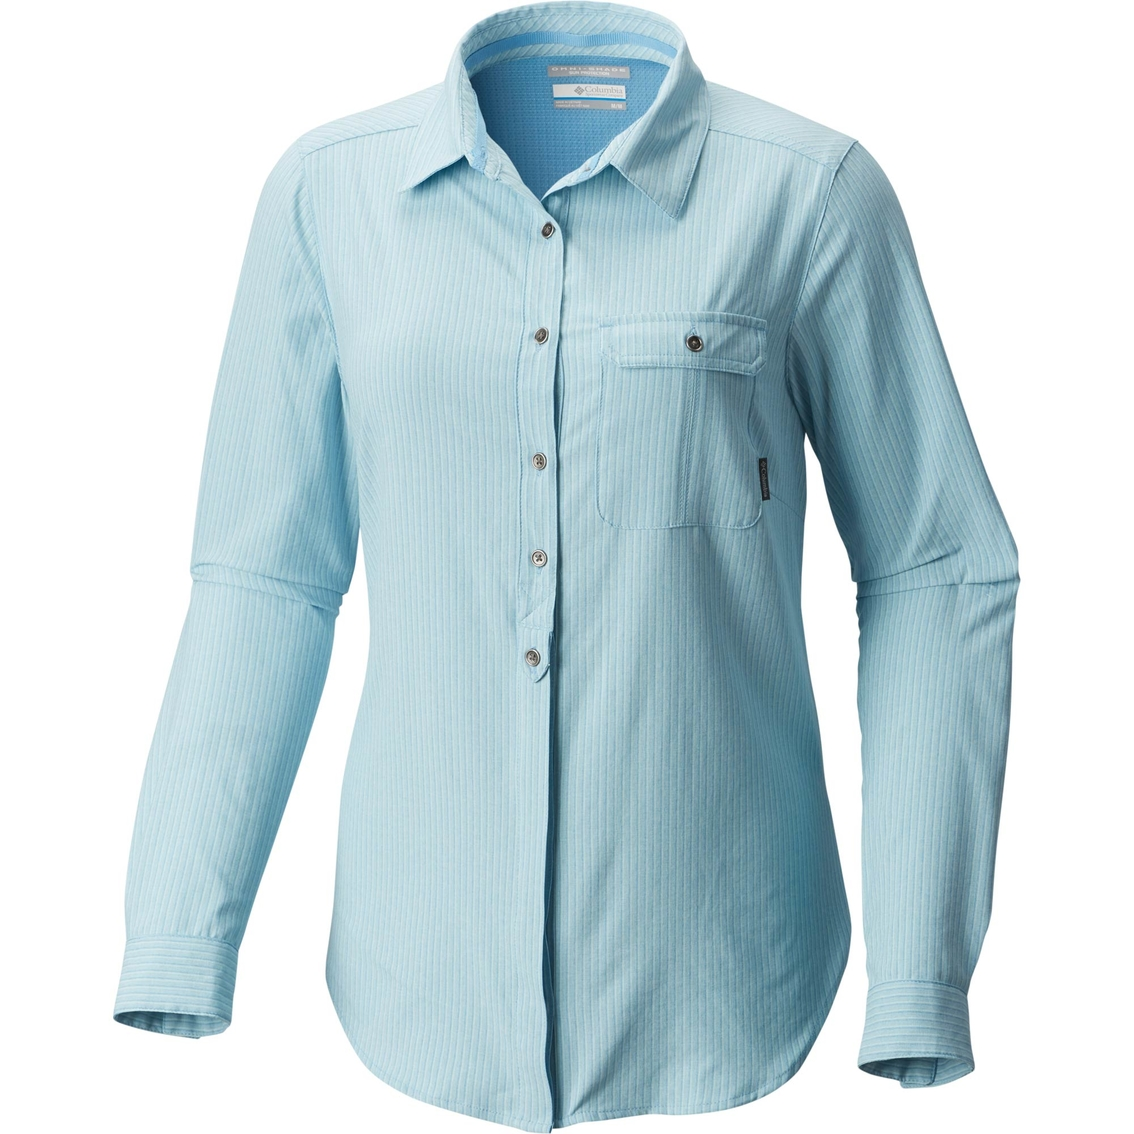 33a64ceac11 Columbia Bryce Canyon Stretch Shirt | Casual Shirts | Apparel | Shop ...